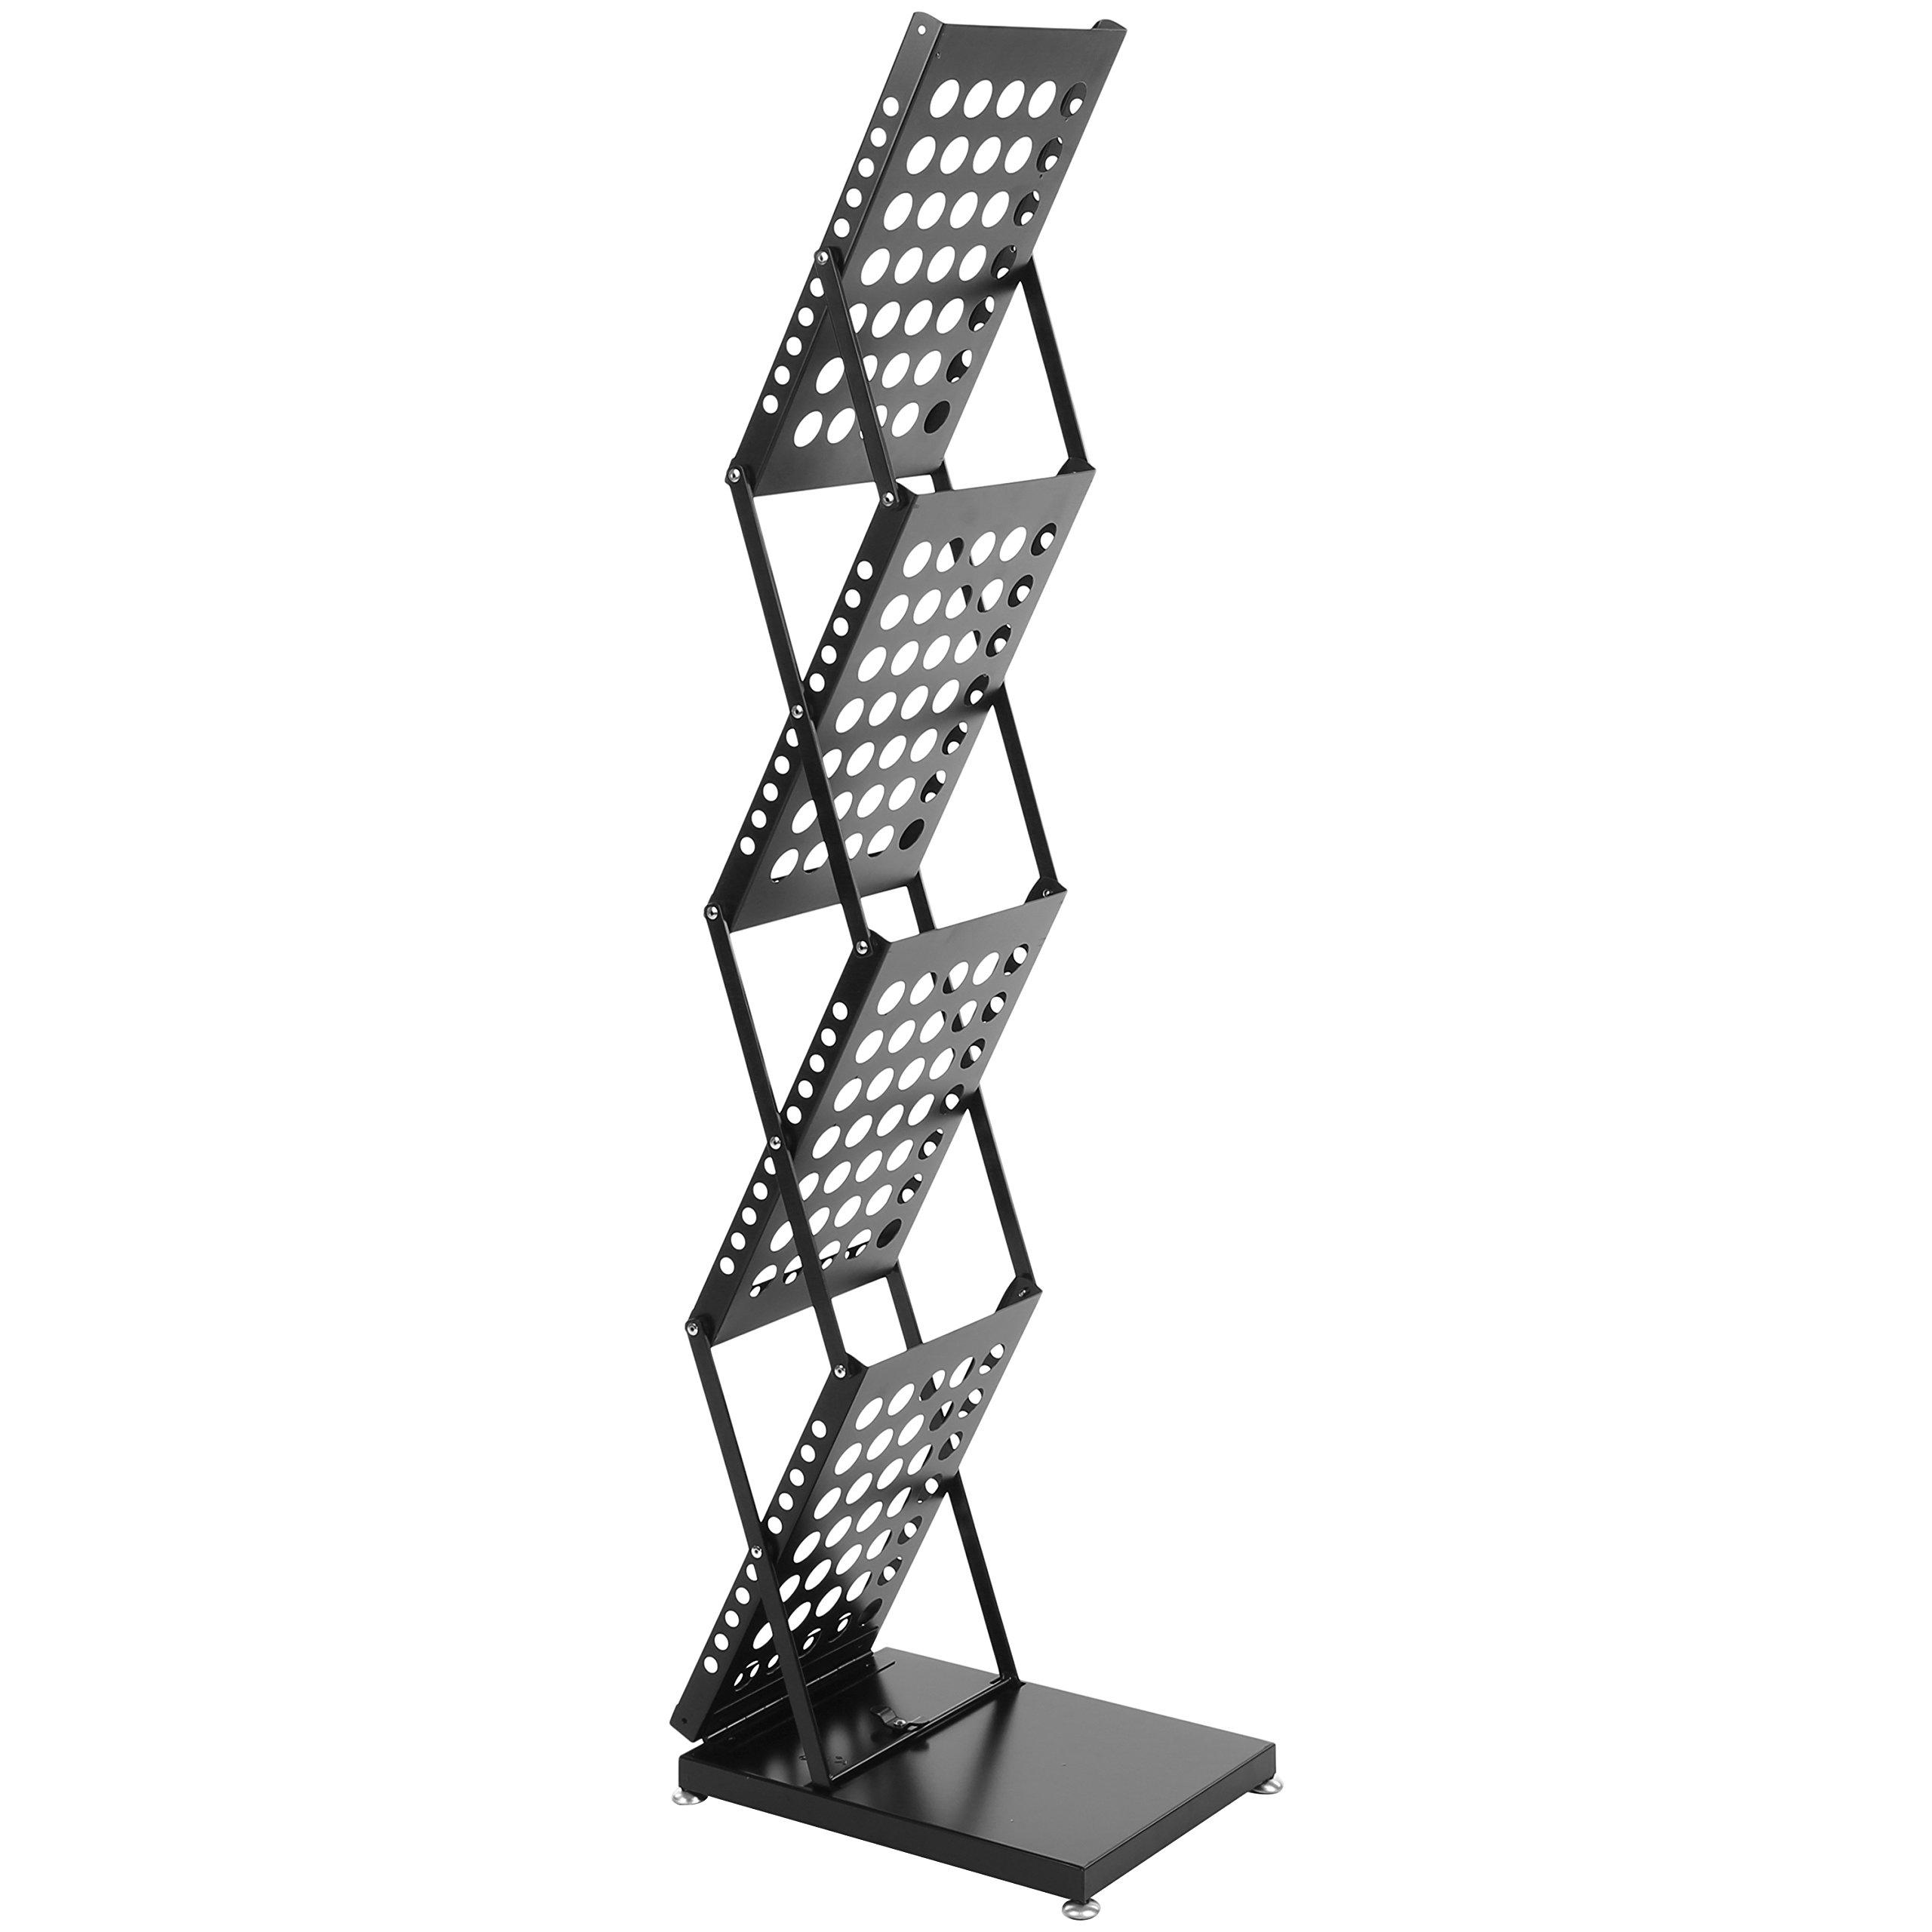 Modern Folding 4 Tier Metal Magazine Rack, Freestanding Literature Display Stand, Black by MyGift (Image #7)